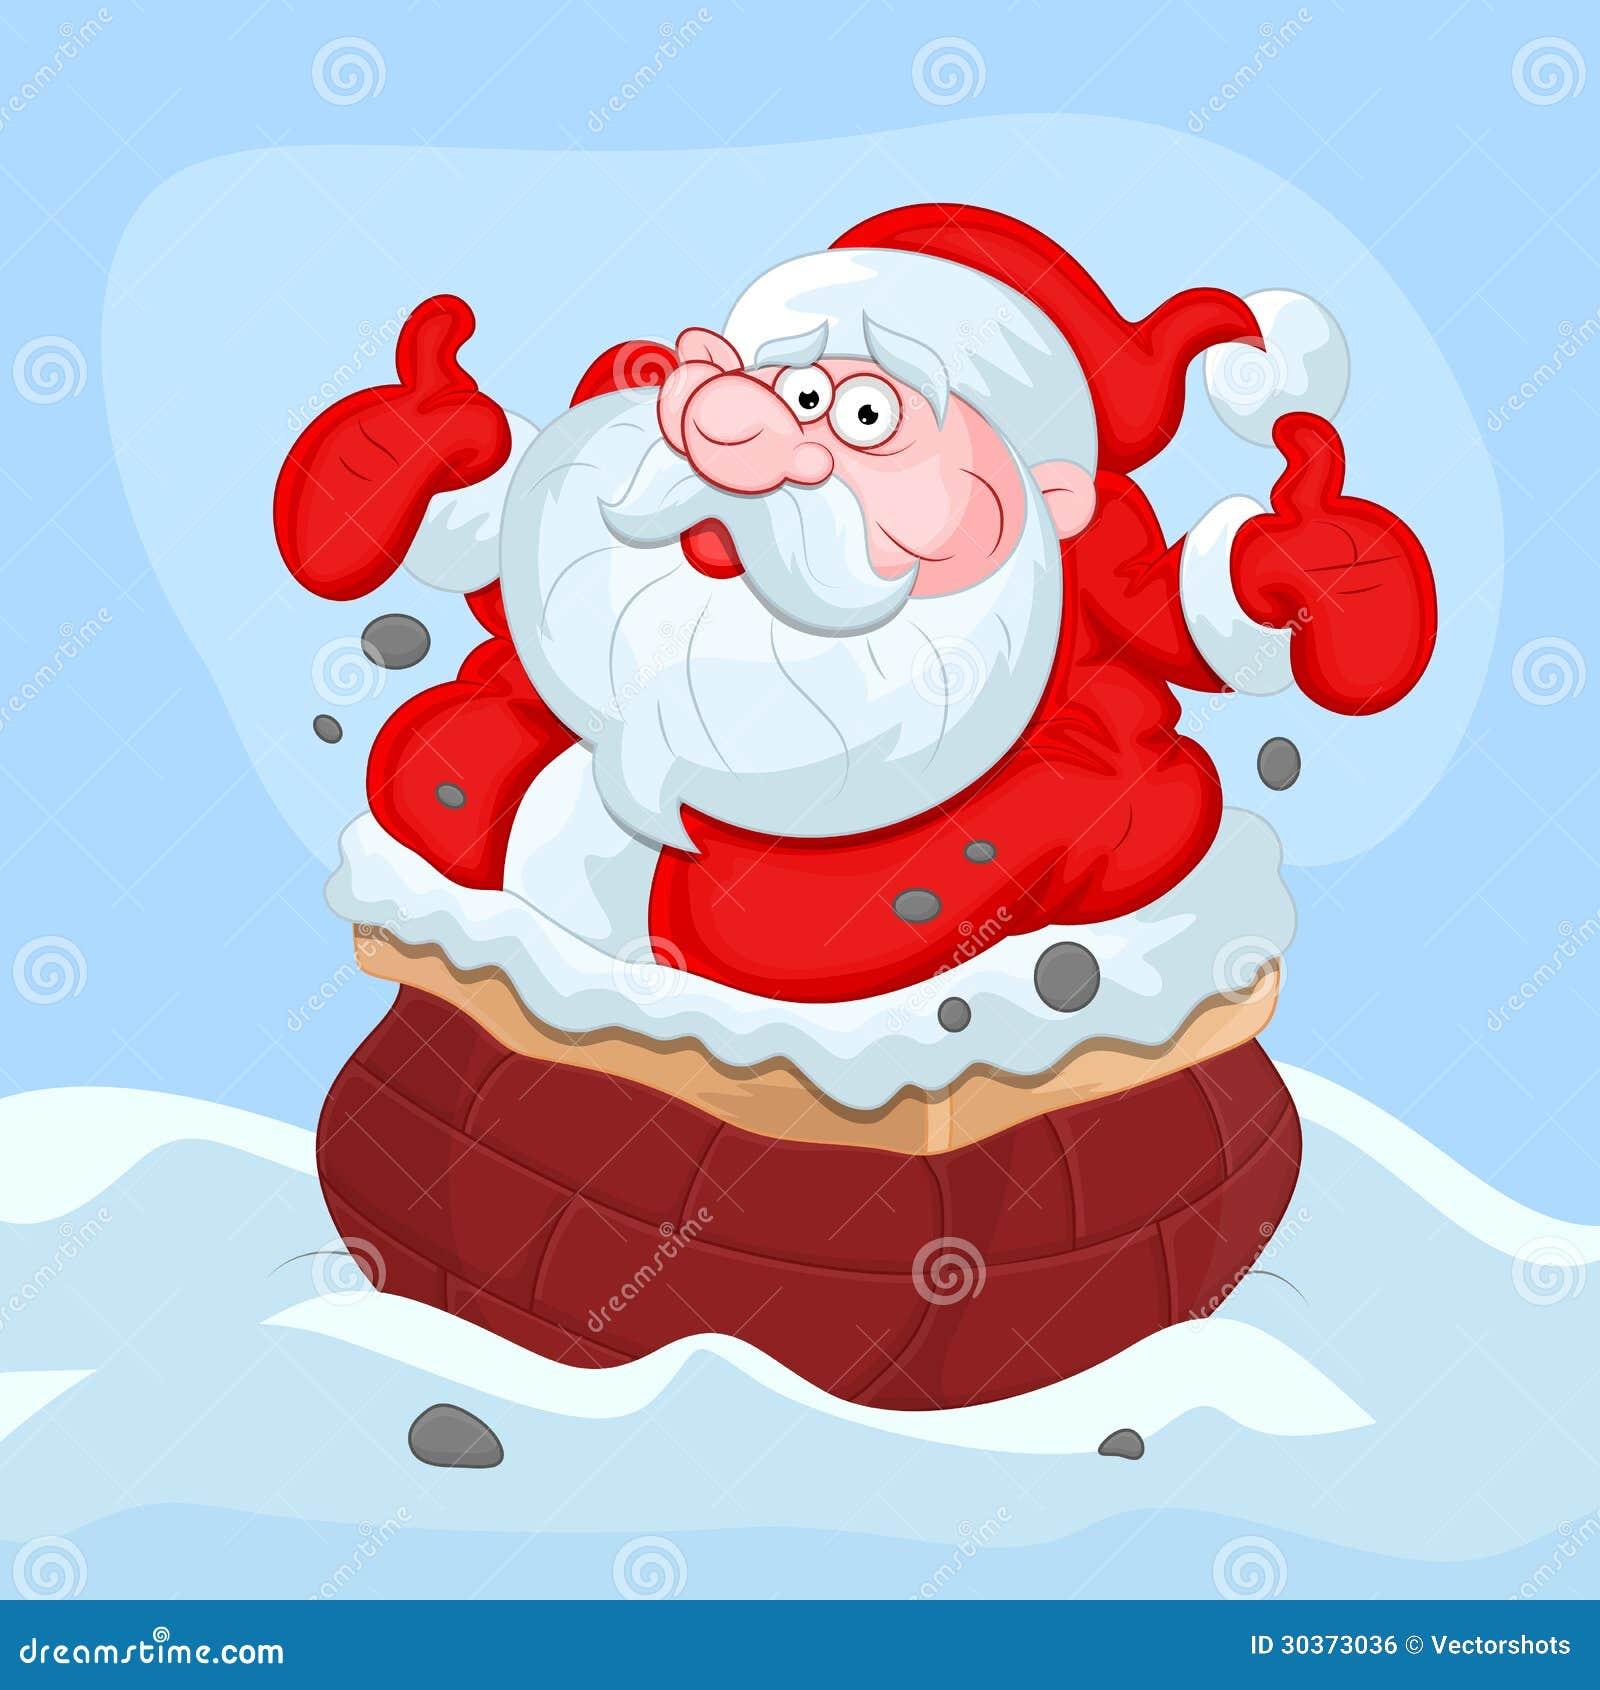 Cartoon Santa Claus - Christmas Vector Illustration Royalty Free ...